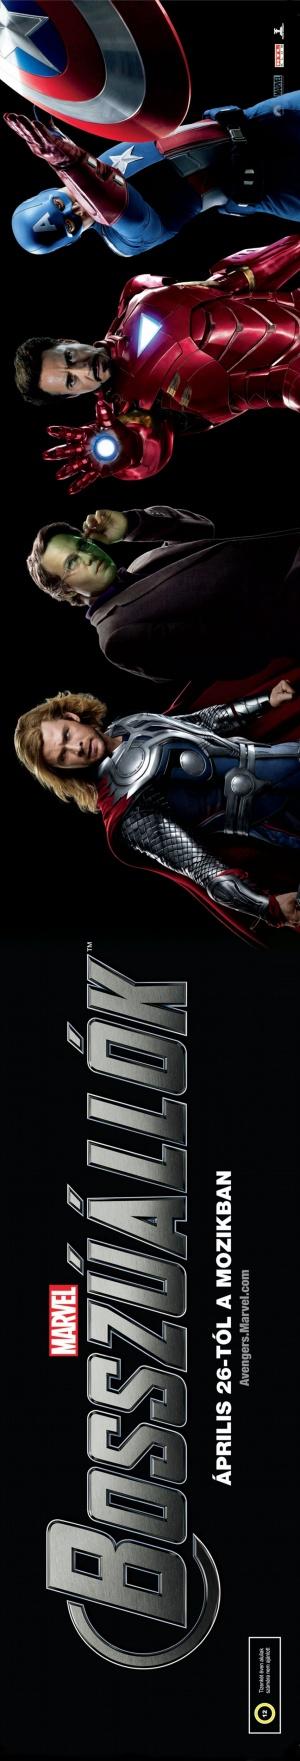 The Avengers 852x5000